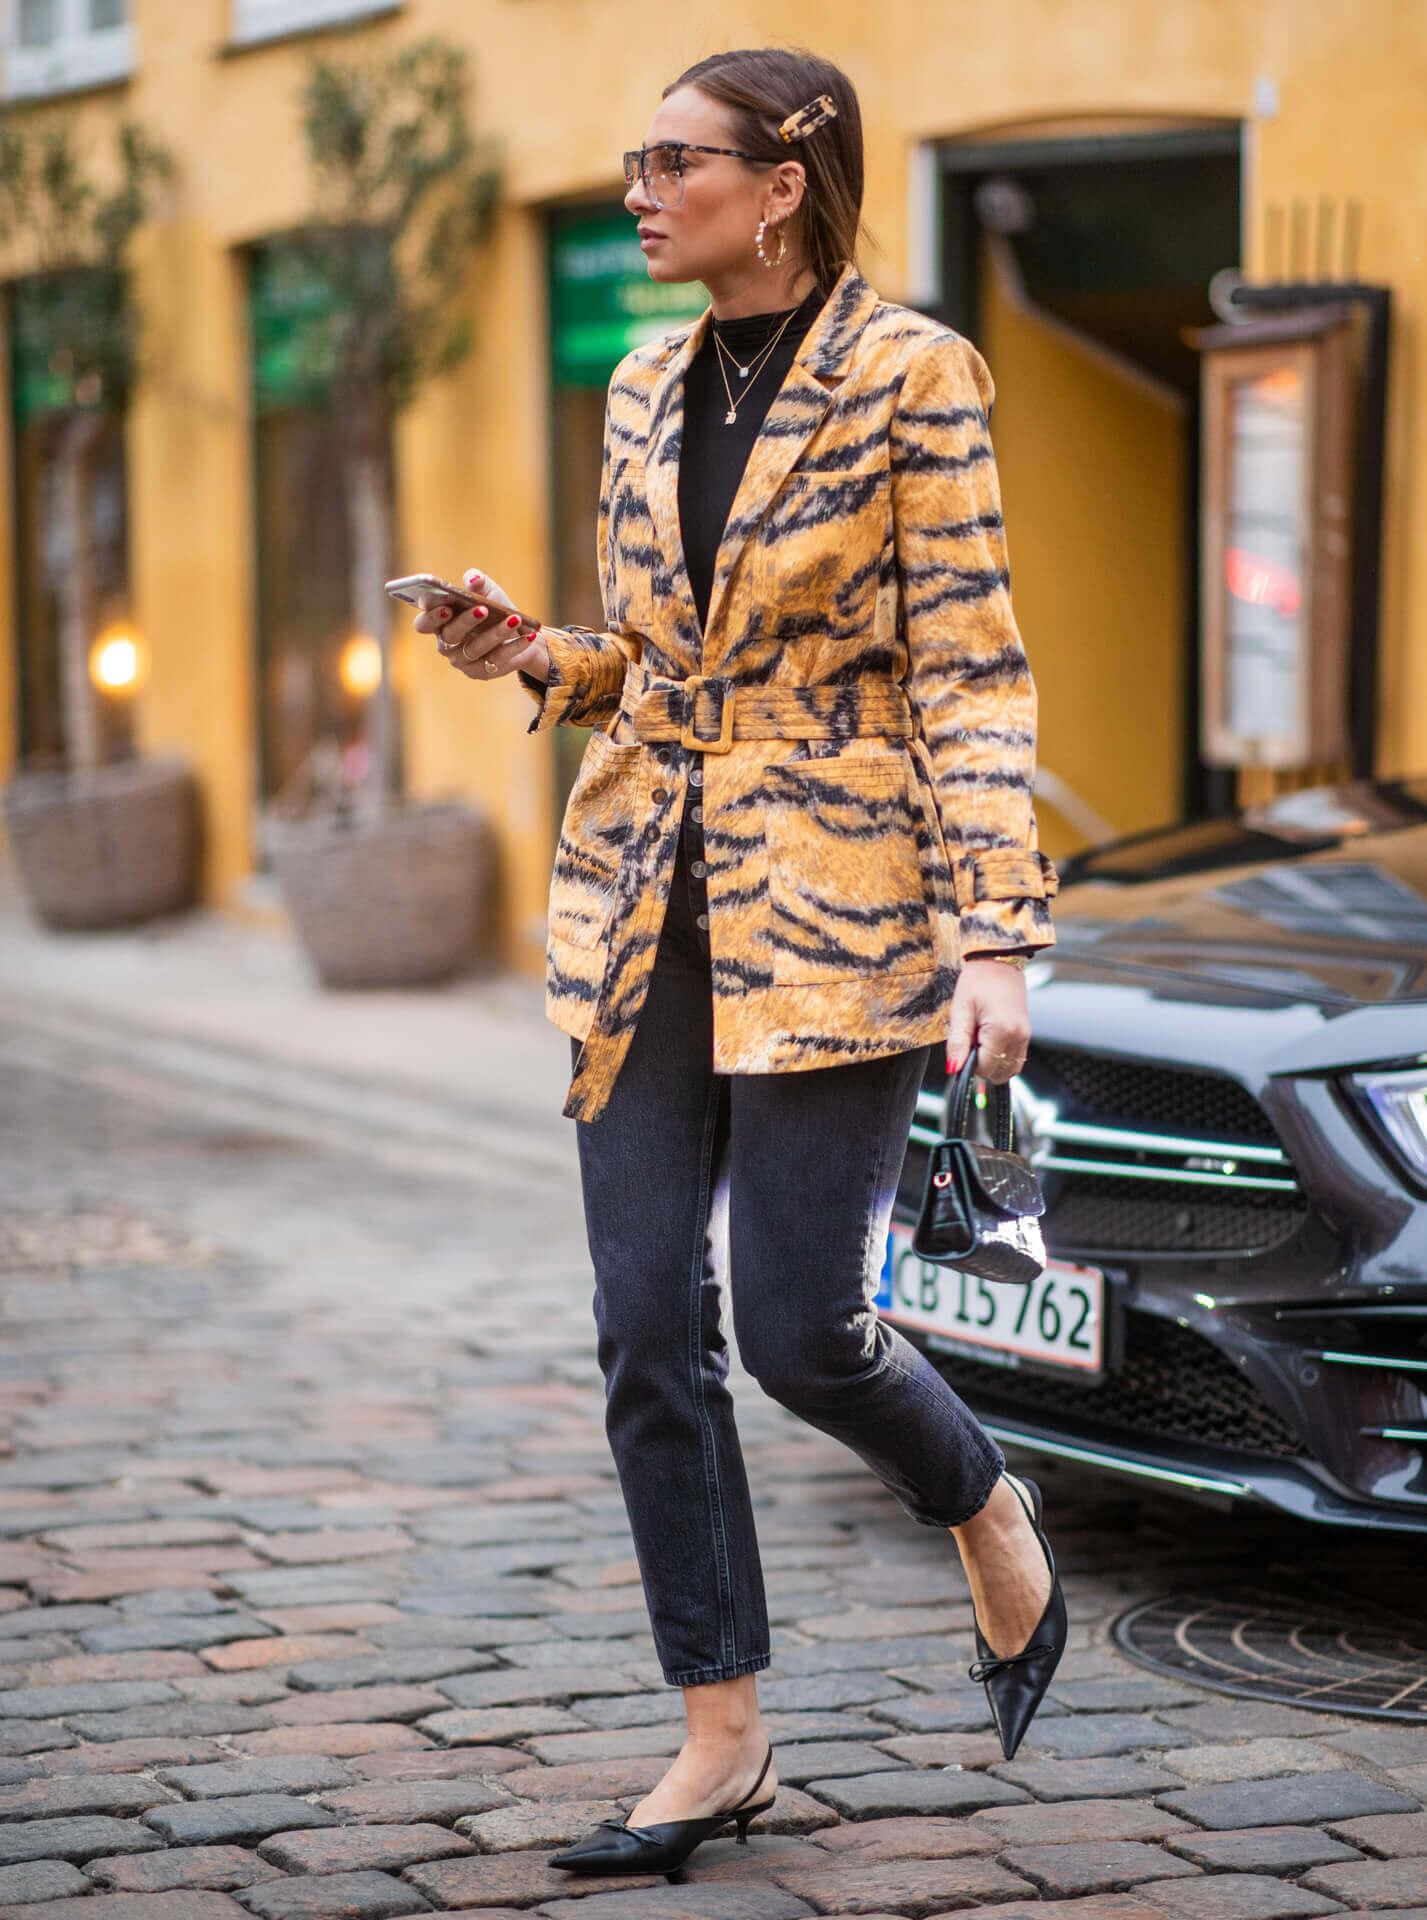 Le mini bag - Danille Bernstein, Streetstyle